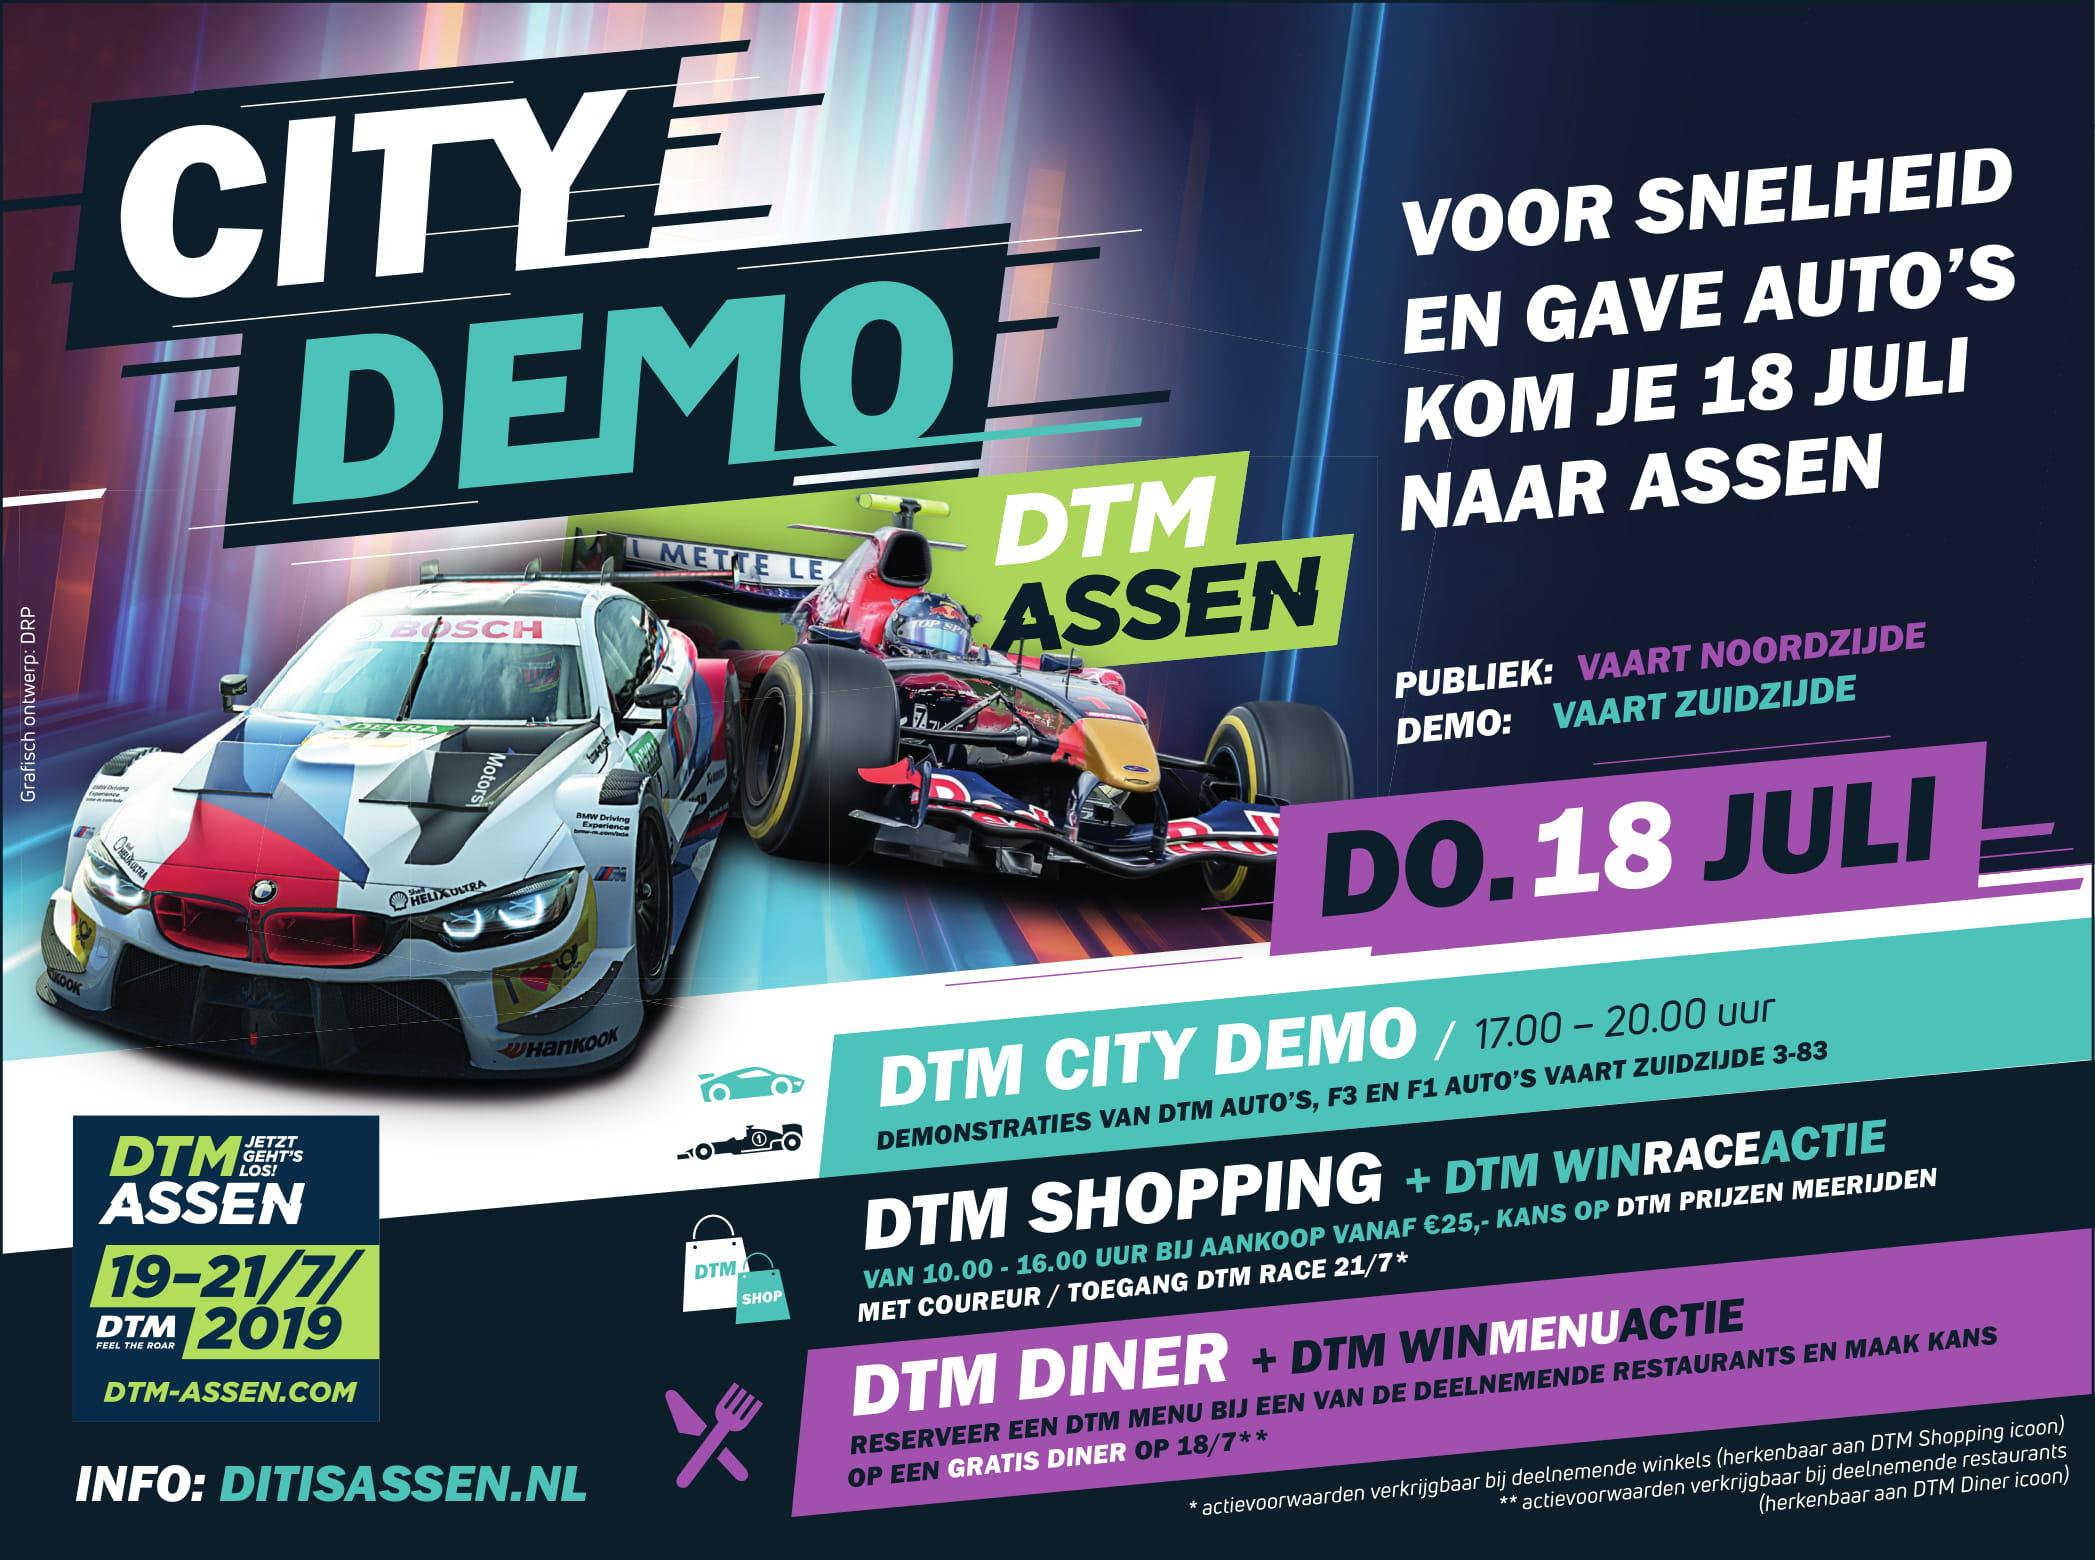 DTM City Demo